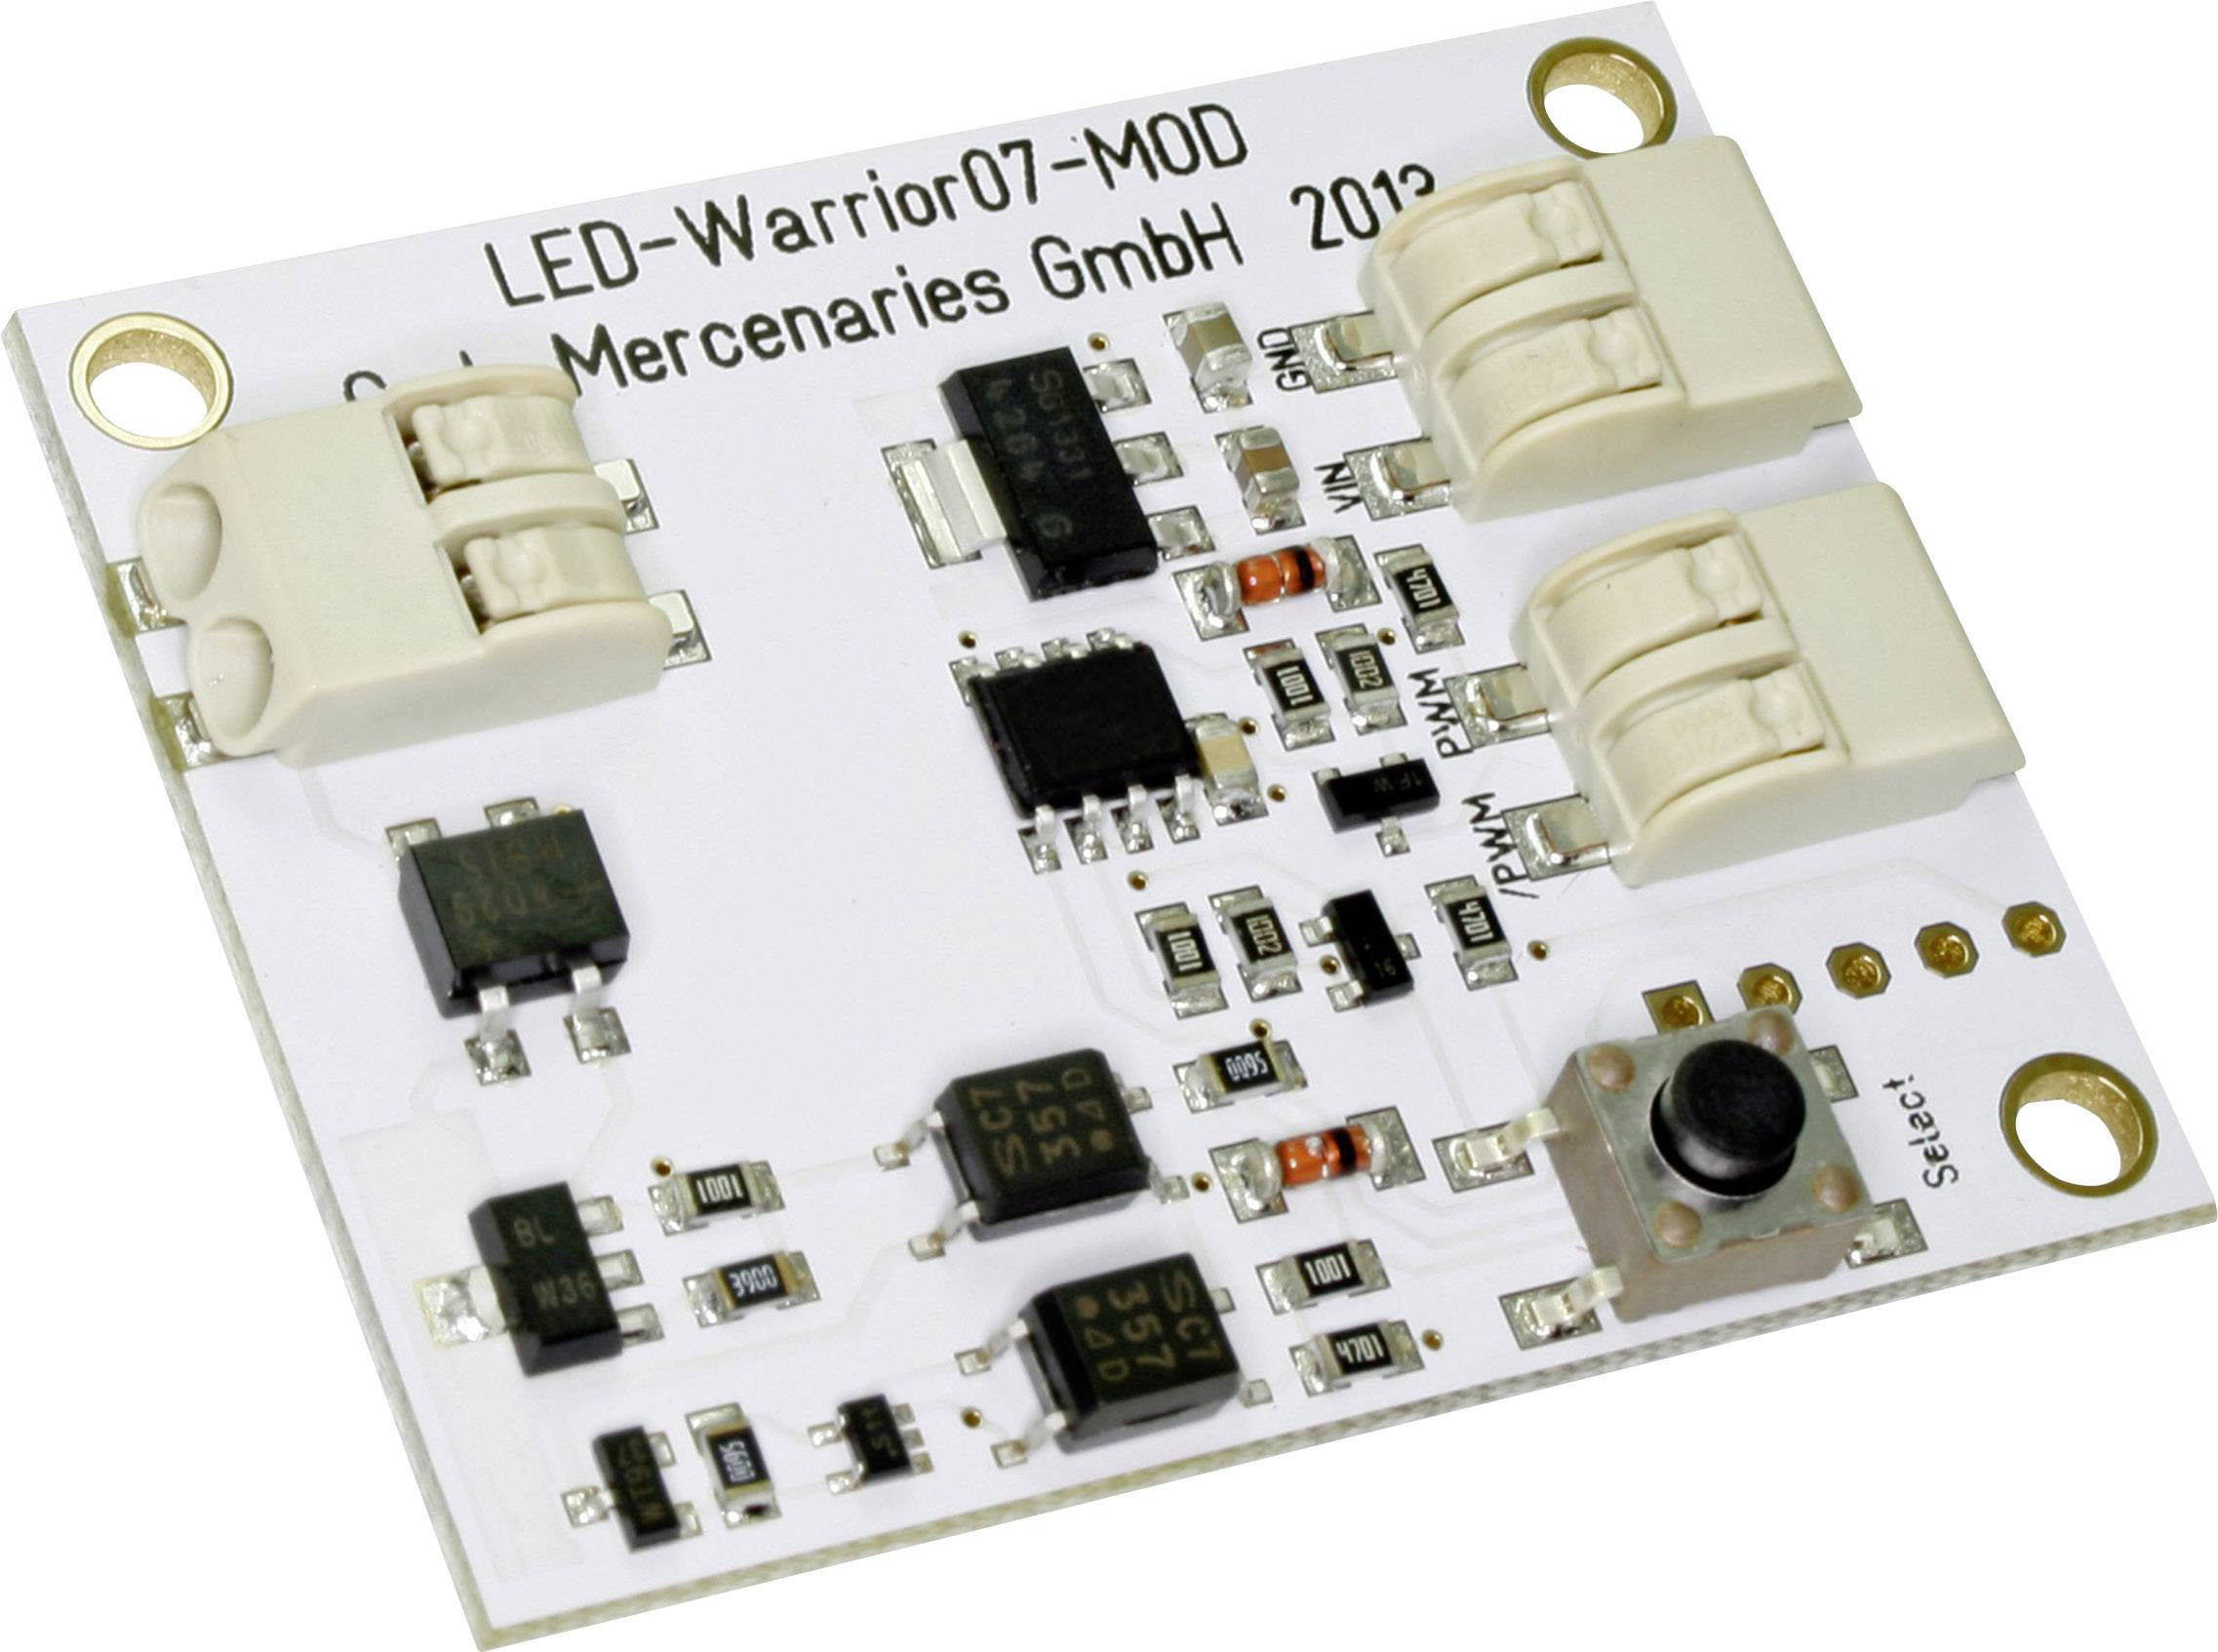 Vývojová deska Code Mercenaries LED-Warrior07-01-MOD